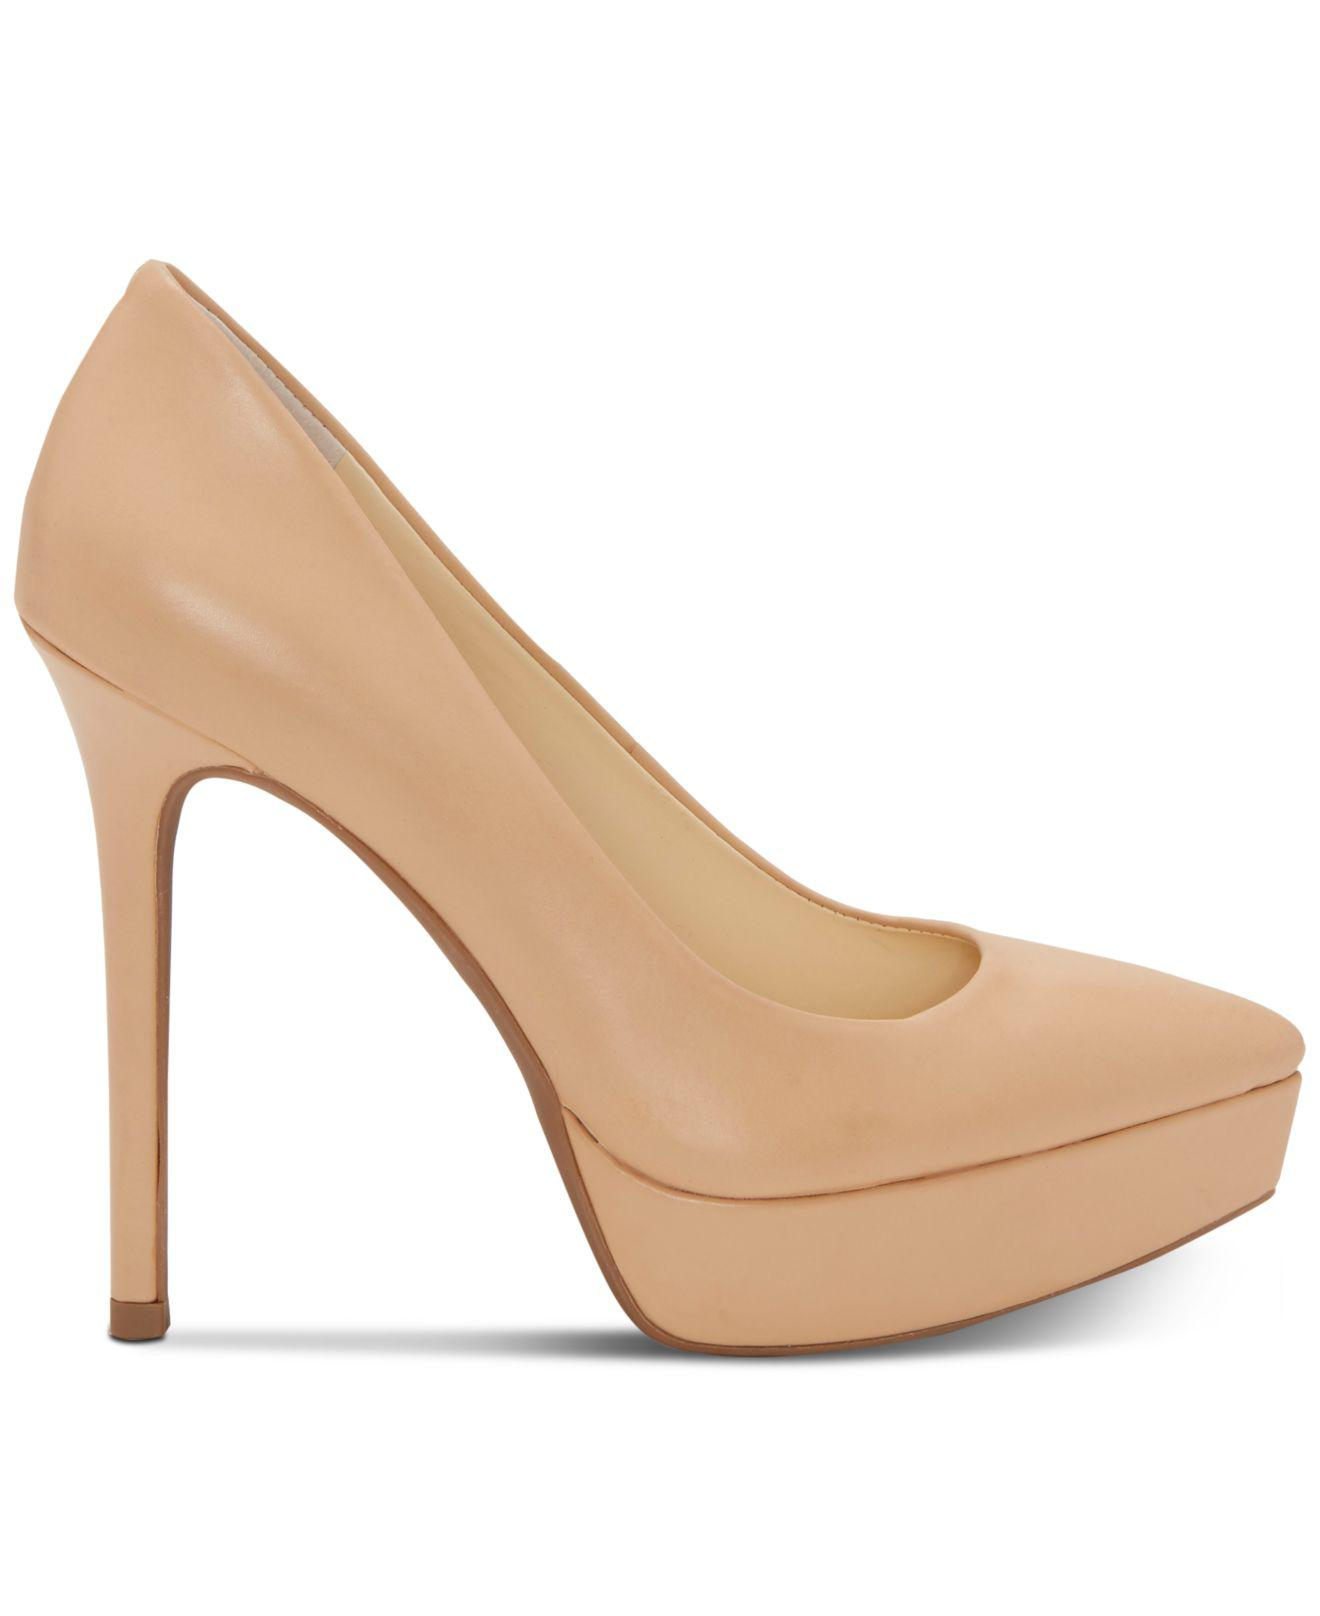 811a0e978275 Jessica Simpson - Natural Lael Pointed-toe Platform Pumps - Lyst. View  fullscreen